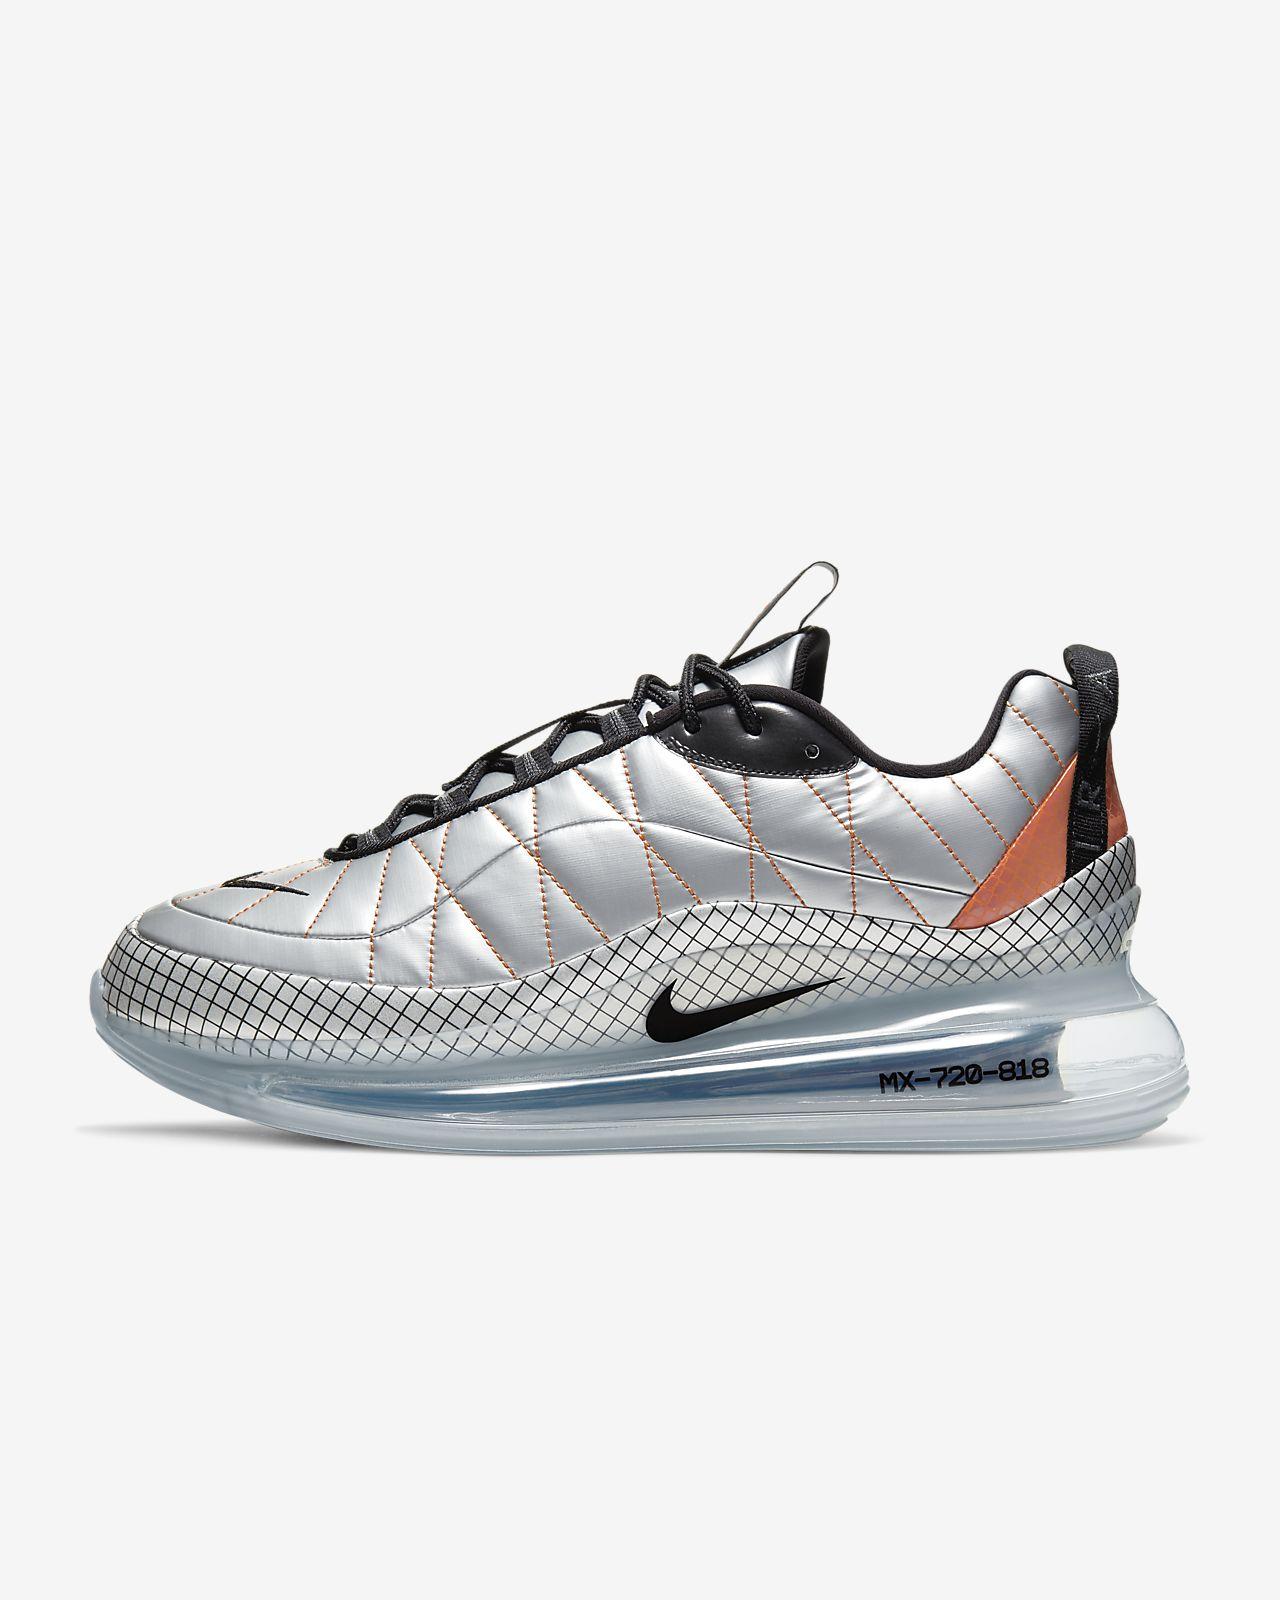 Nike MX 720 818 | Size?